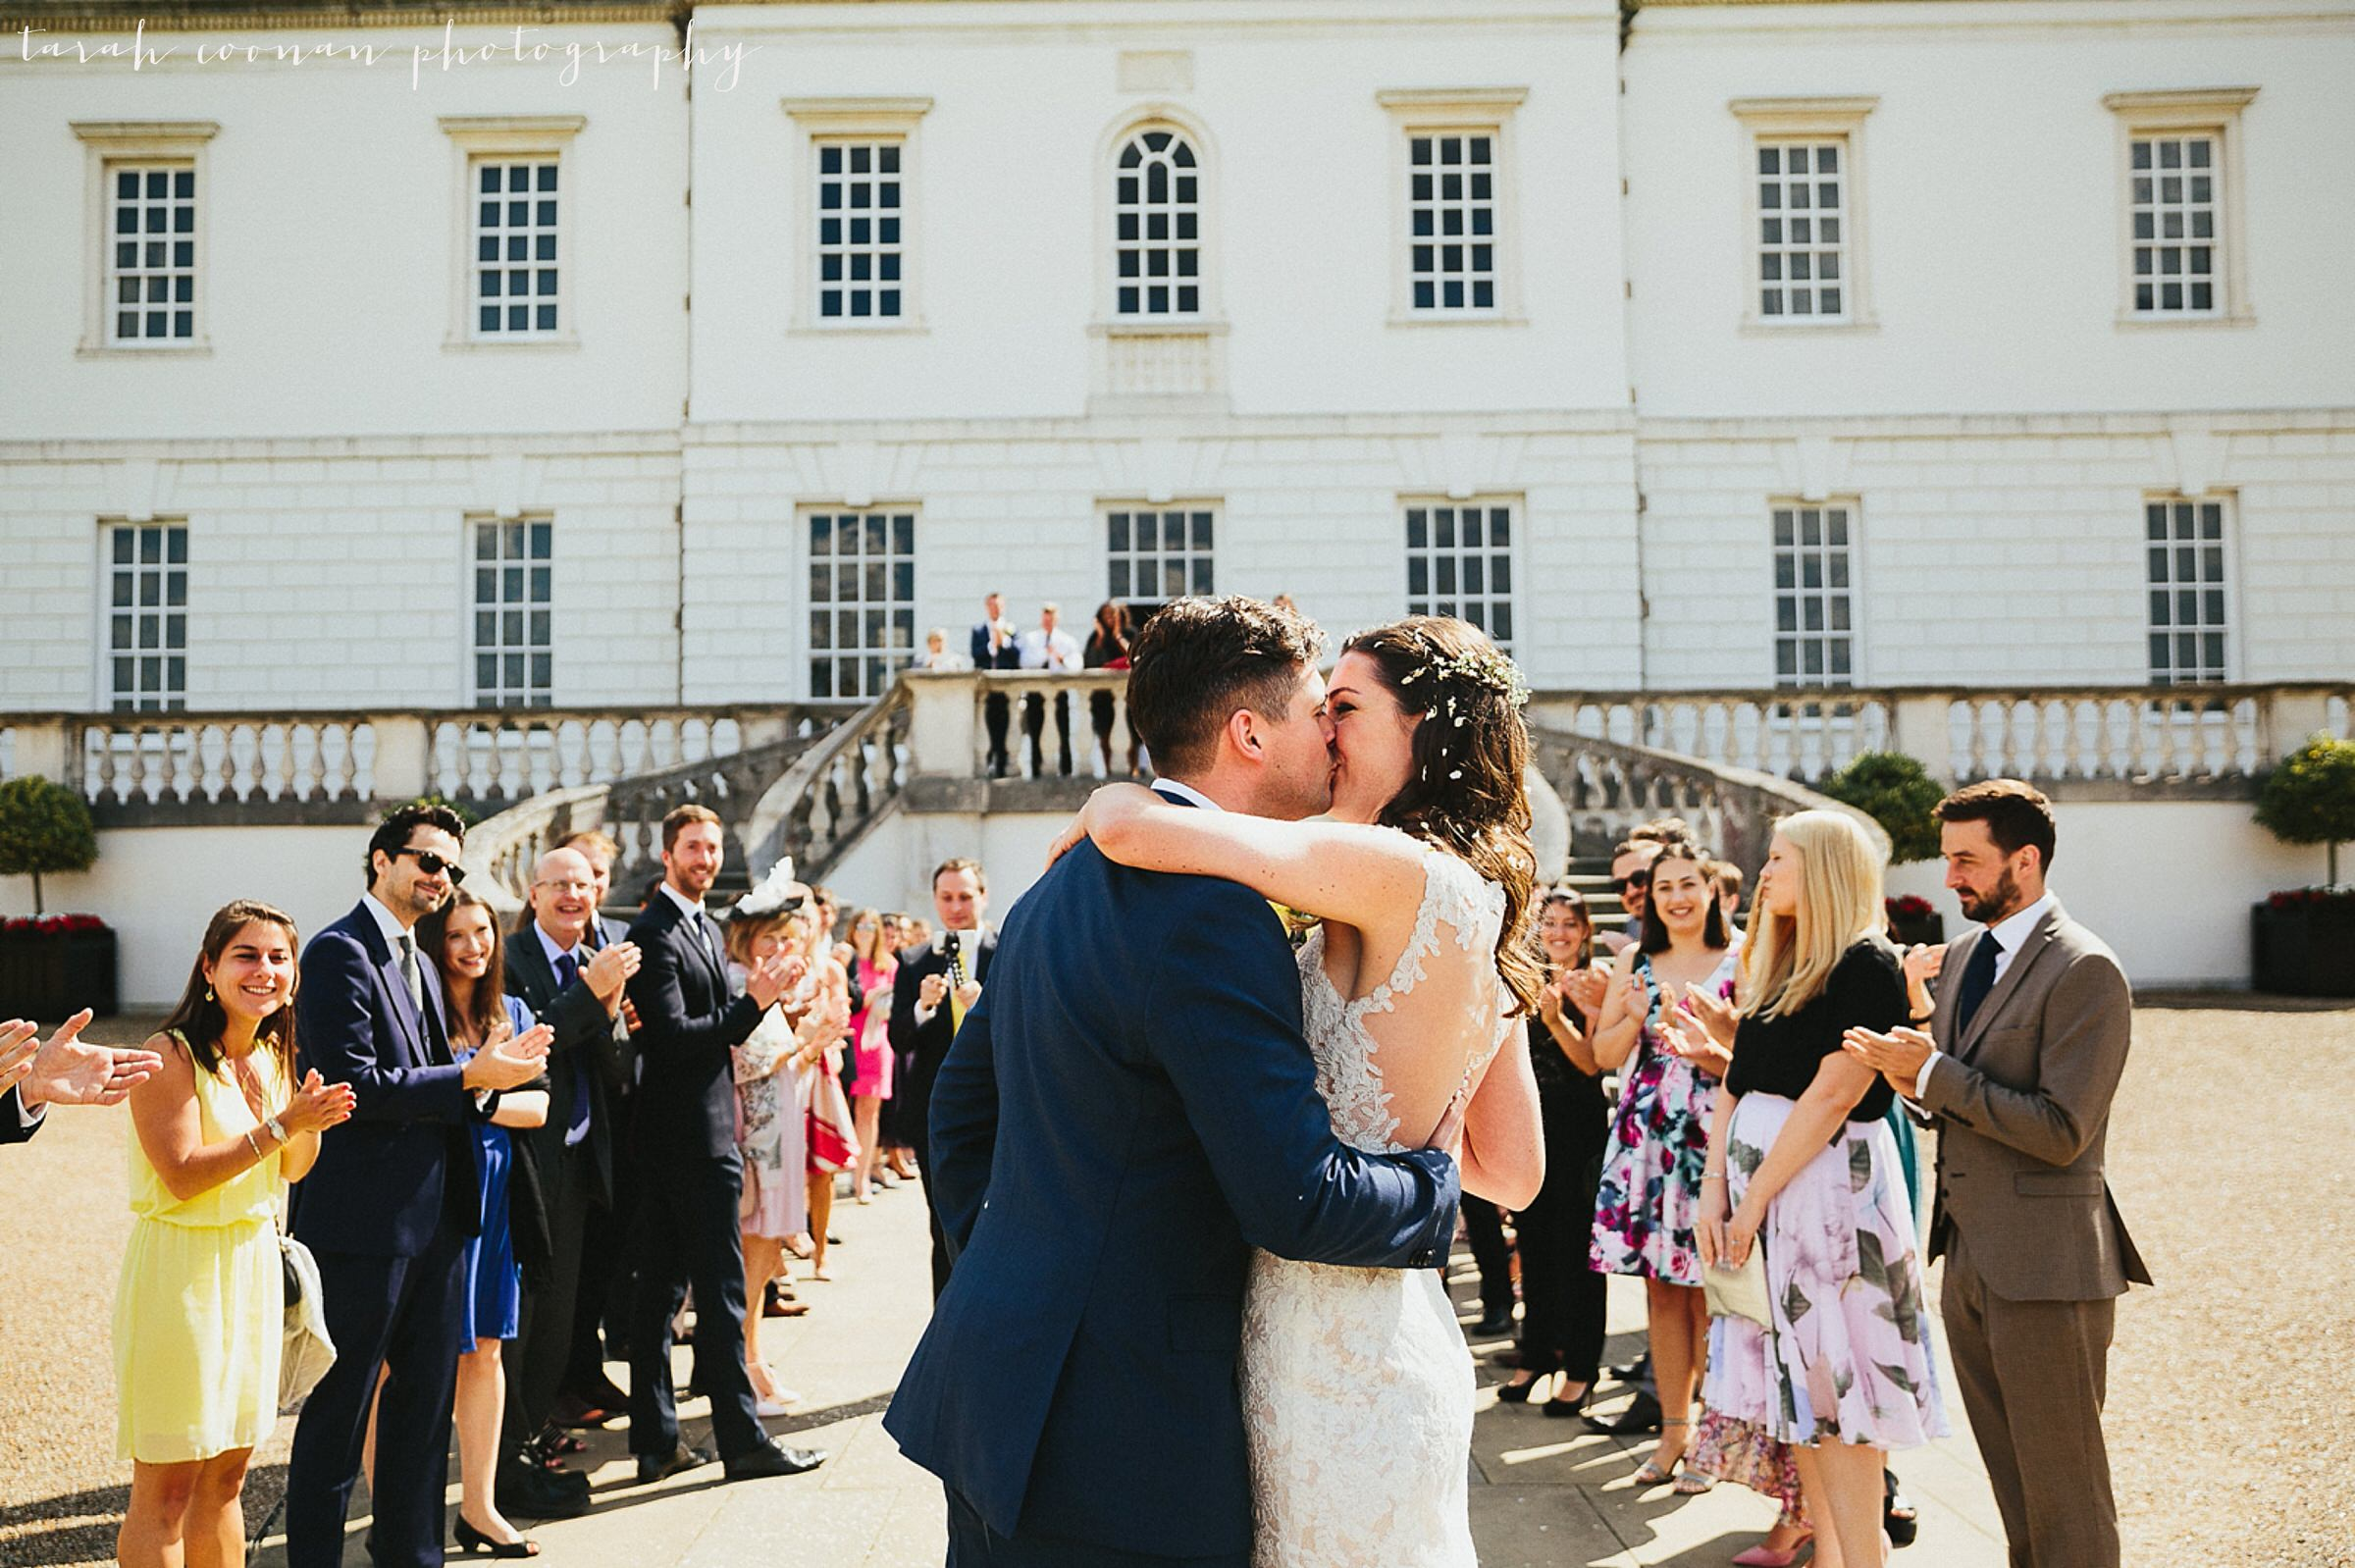 London stately home wedding